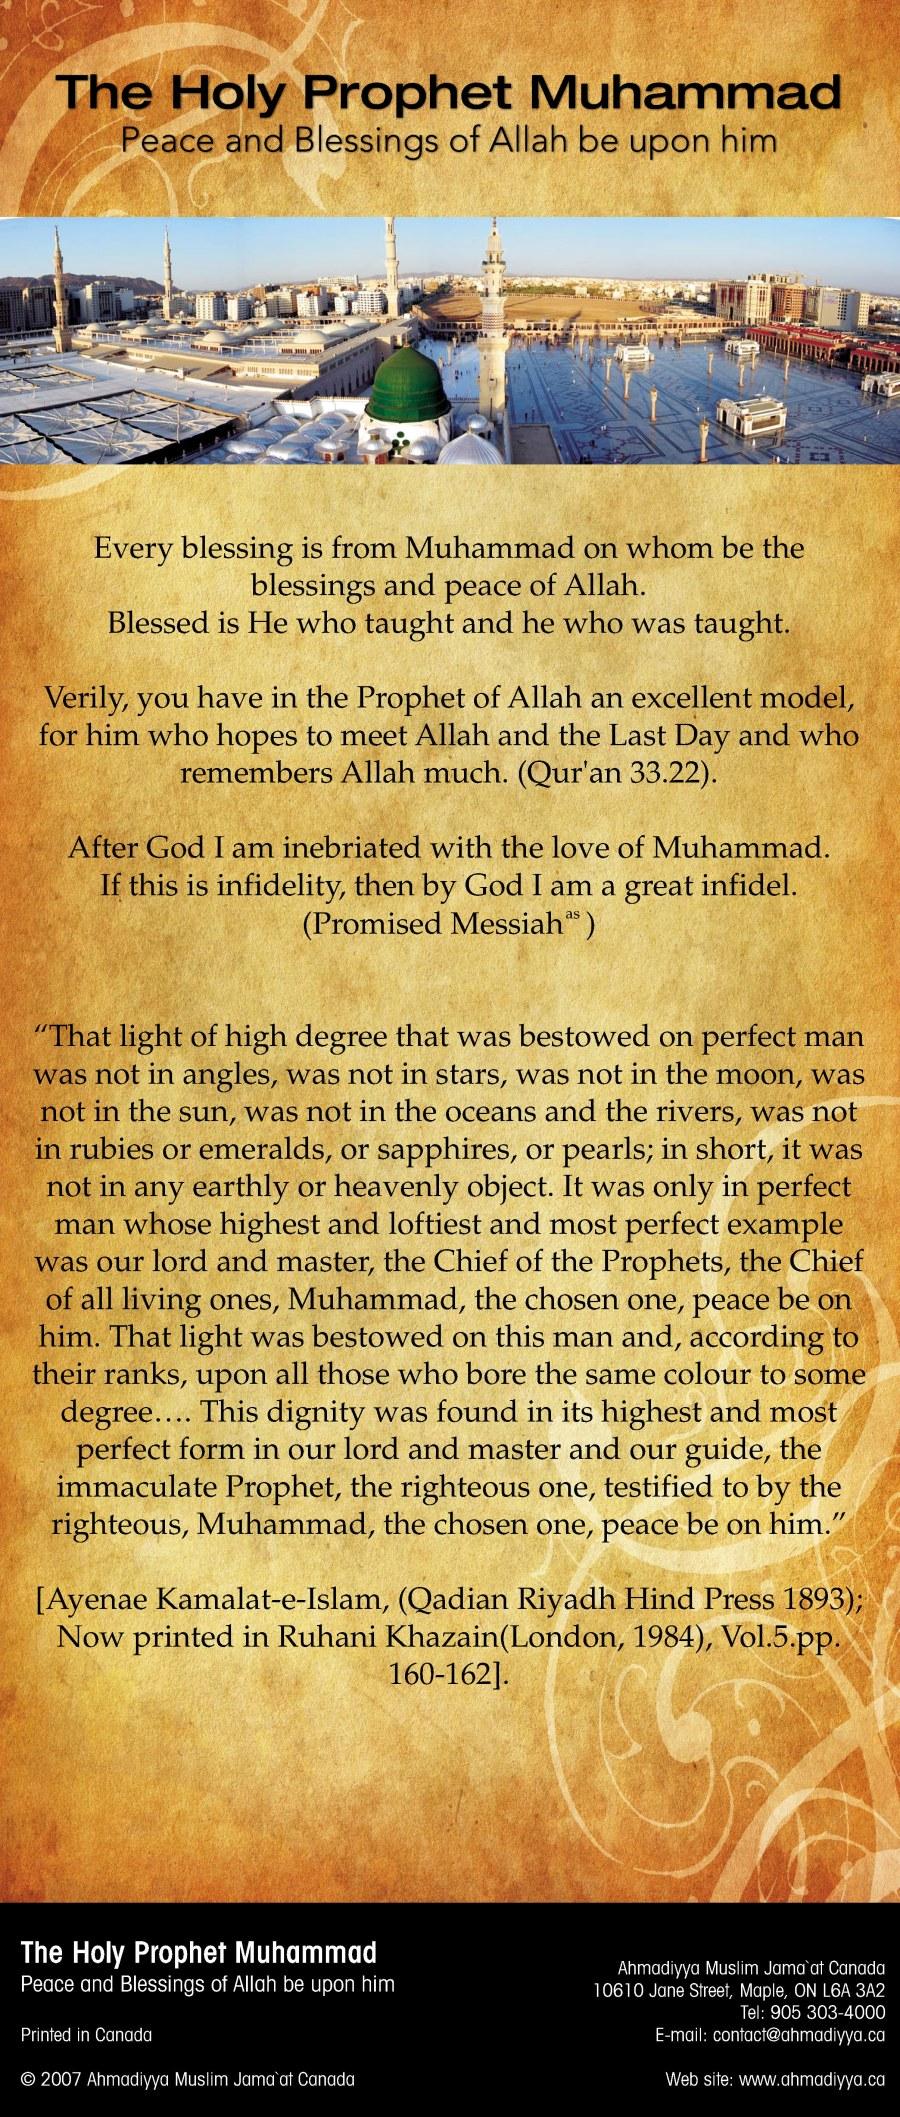 islam and the prophet muhammad peace be upon him essay The mercy of prophet muhammad peace be upon him | bilal assad memphis islamic center (mic) 30,556 views 1:17:34 sheikh bilal assad ┇the barakah.